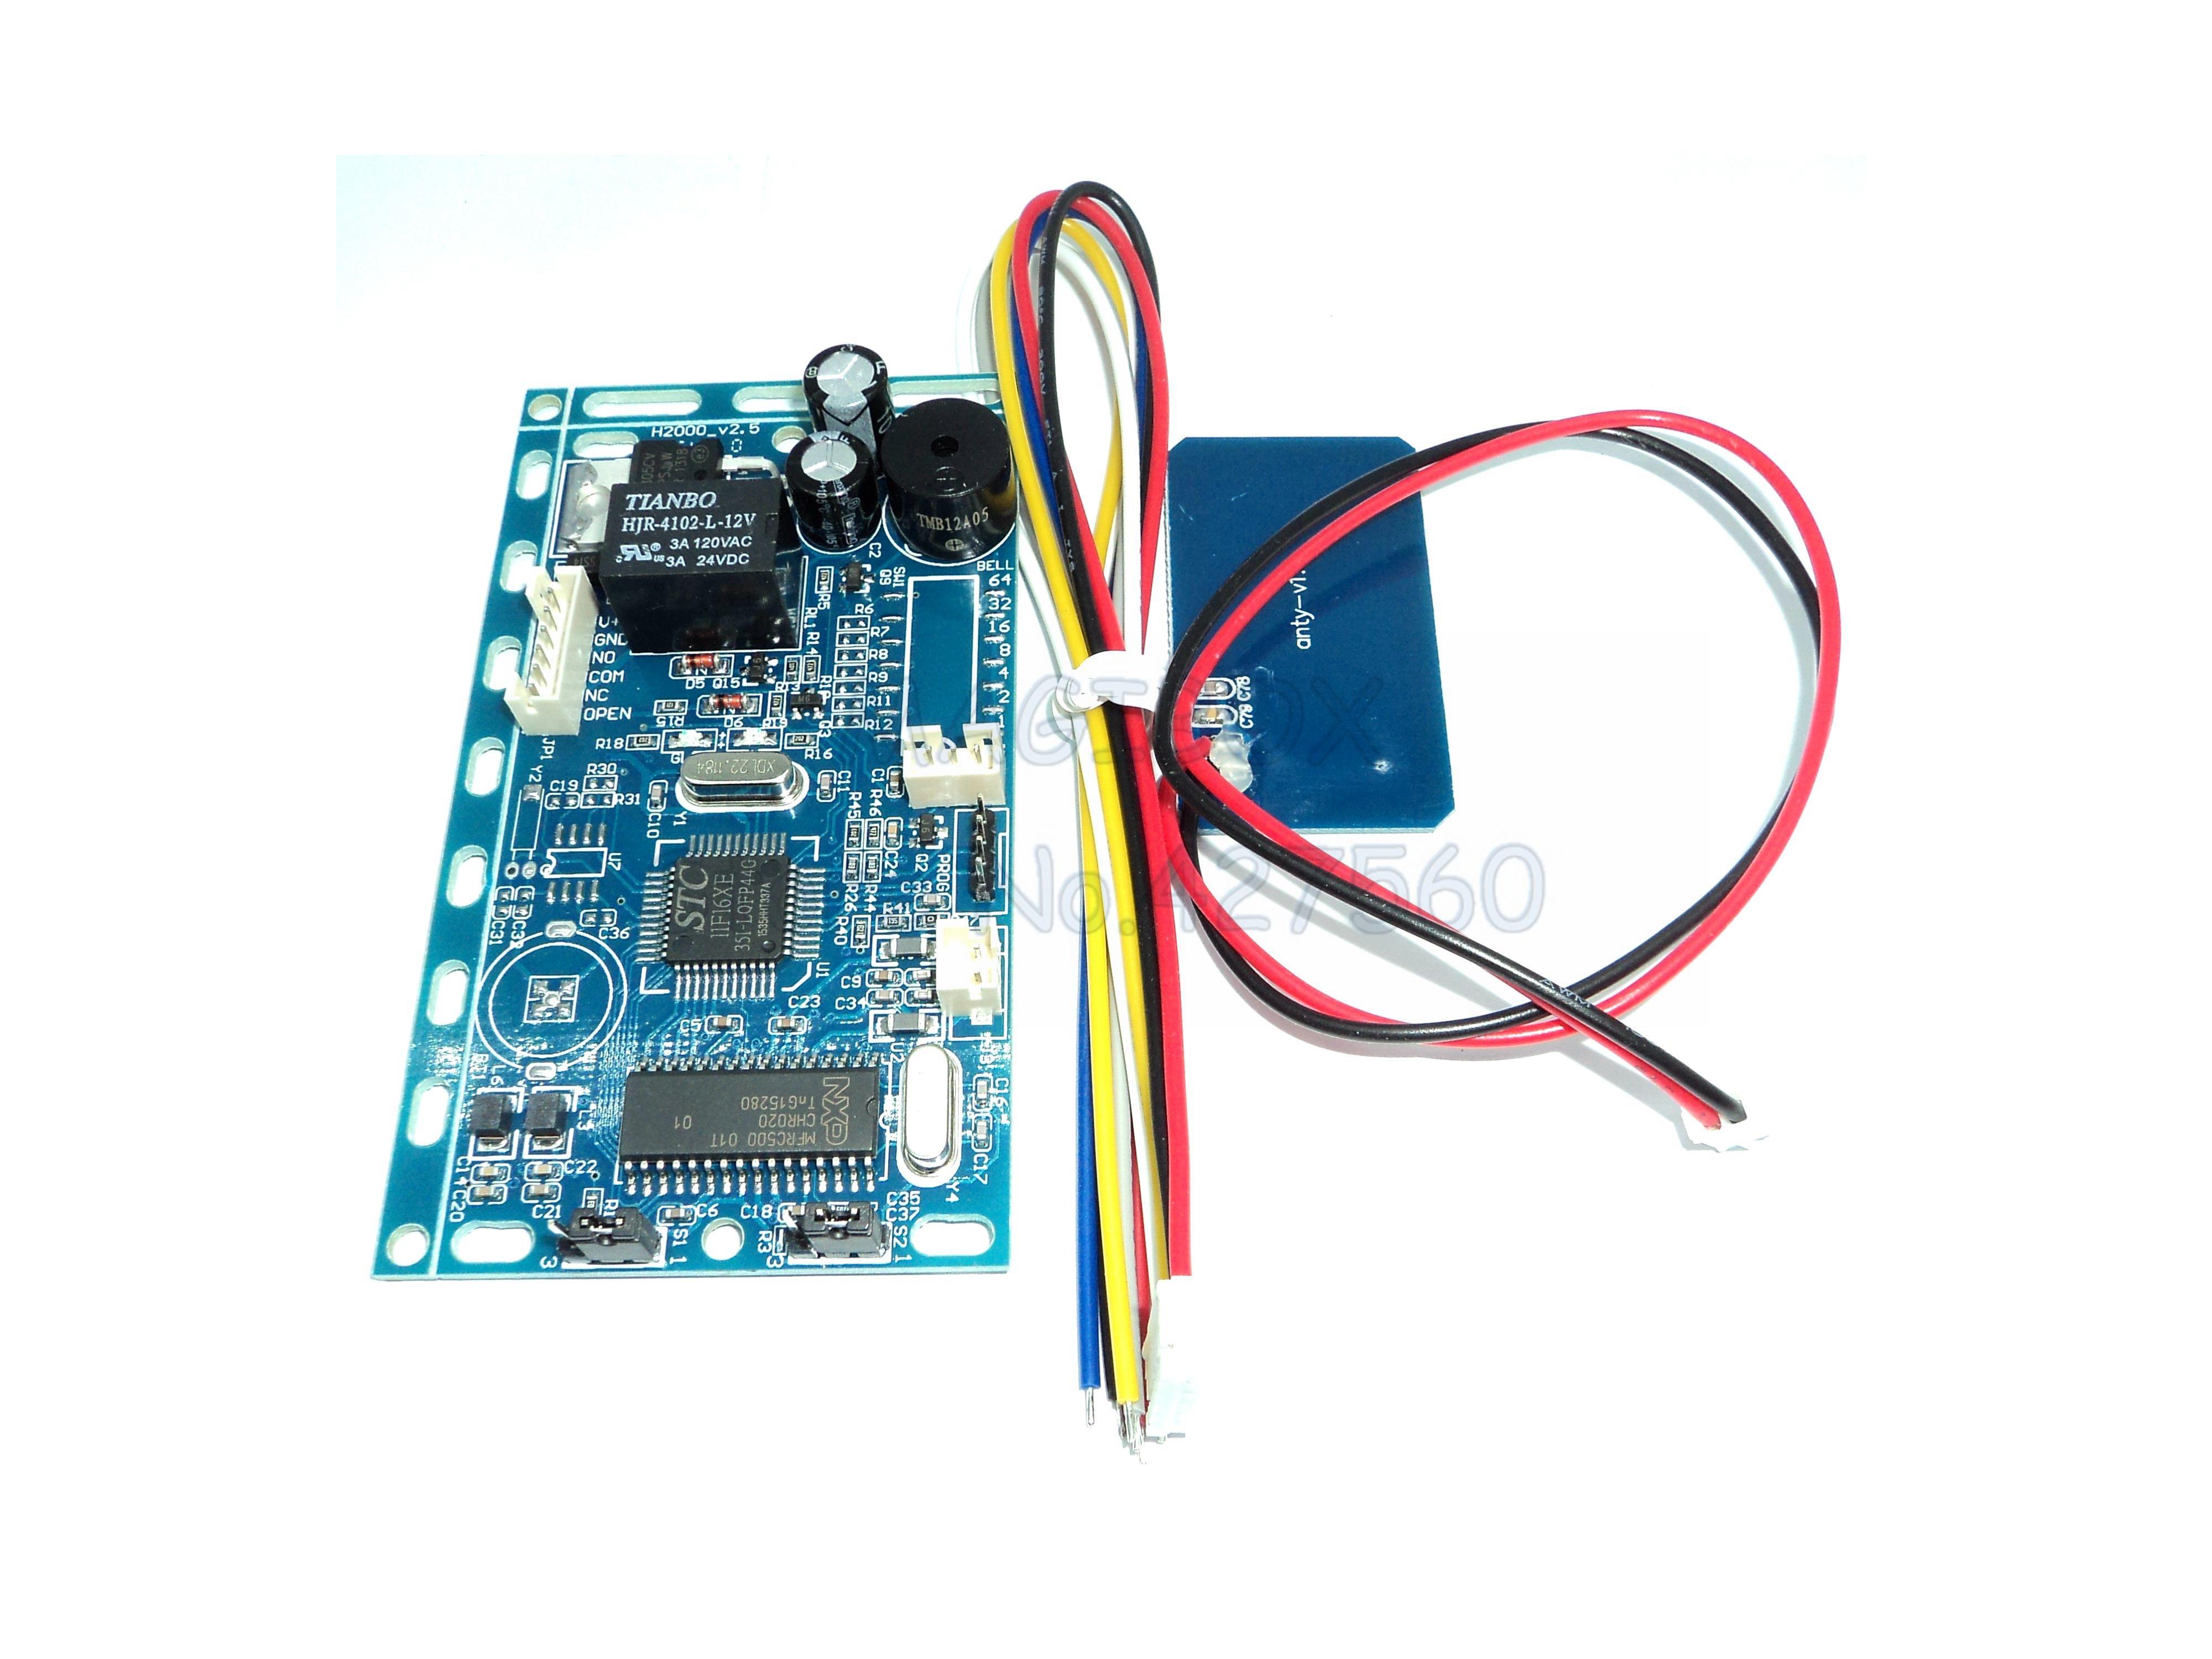 RFID Intercom Embedded Access Control 13.56mhz IC Module Controller 2000 User